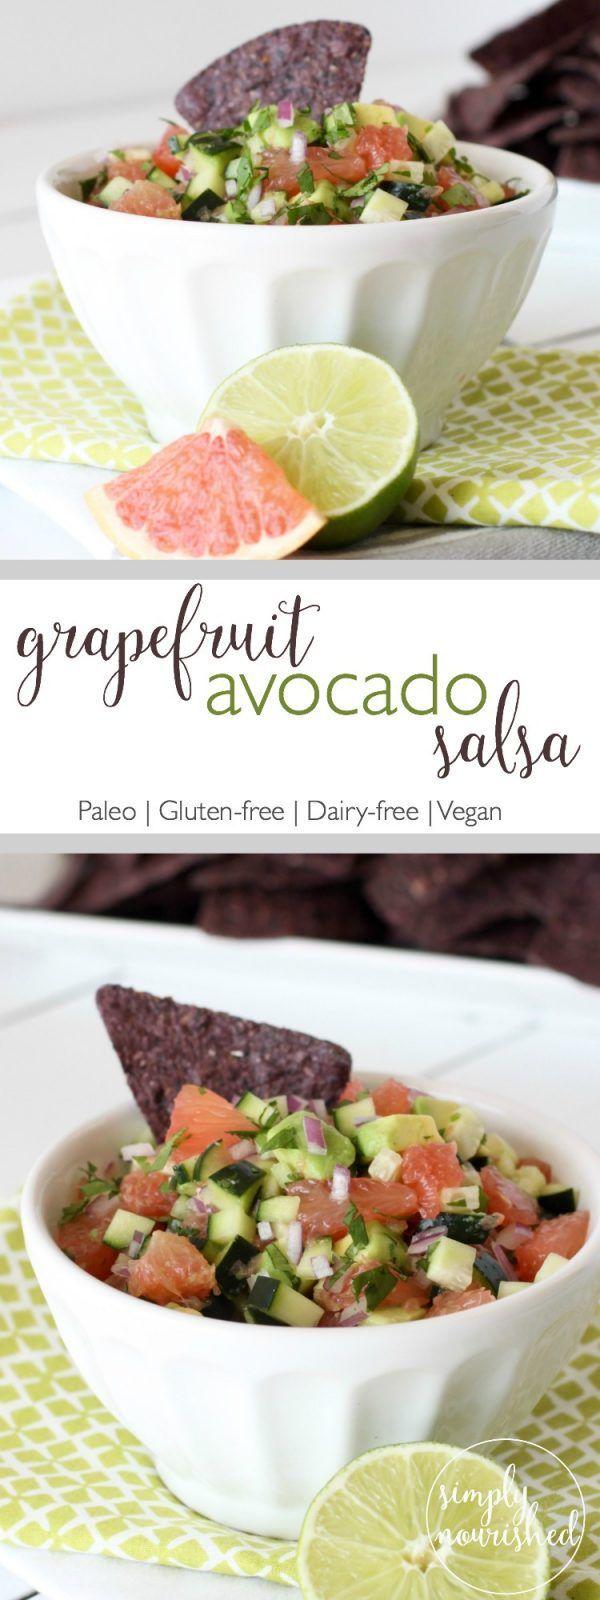 Grapefruit Avocado Salsa   #justeatrealfood #simplynourishedrecipes